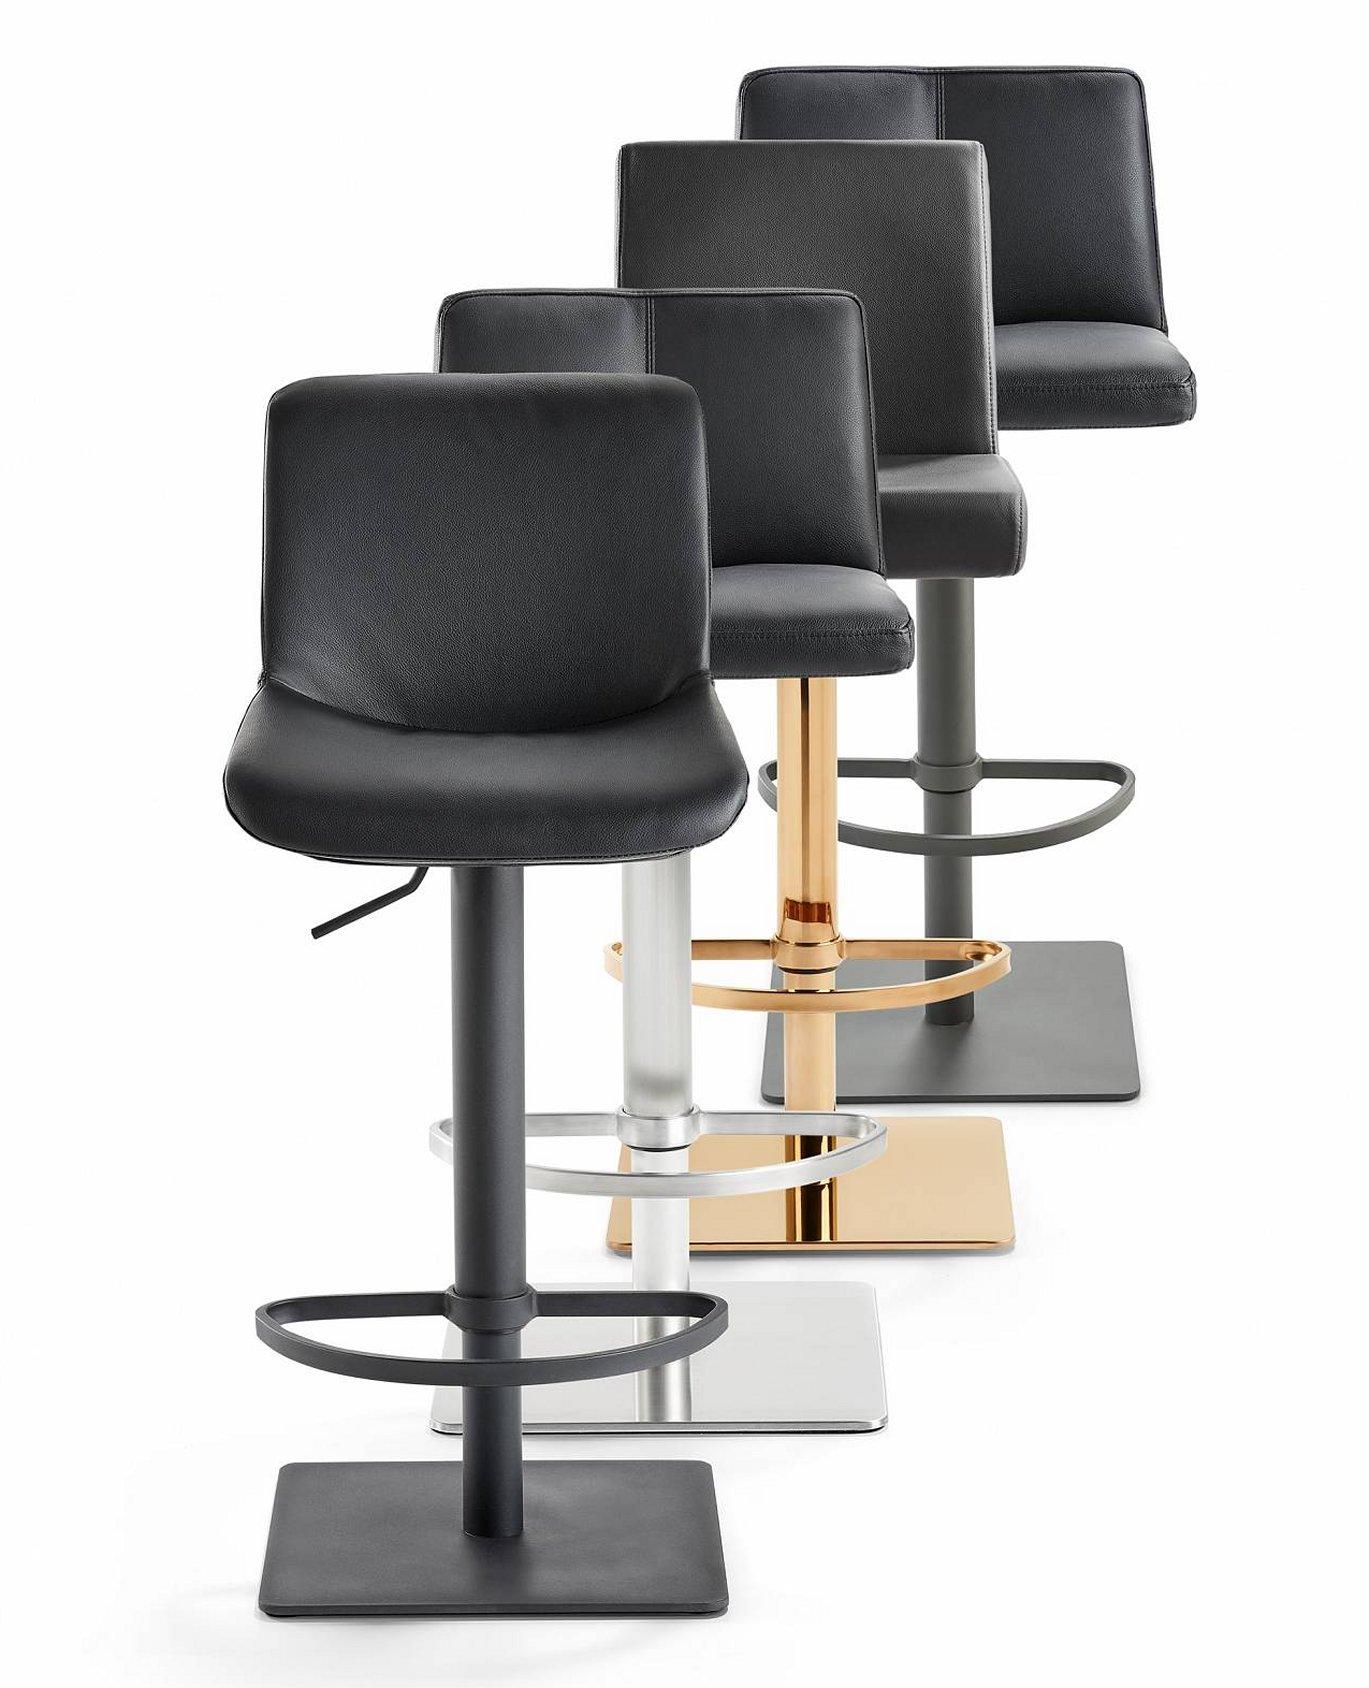 Stabiler Schalensitz Barhocker Gepolstert Echt Leder Sitzbezug Stahlgestell Schwarz